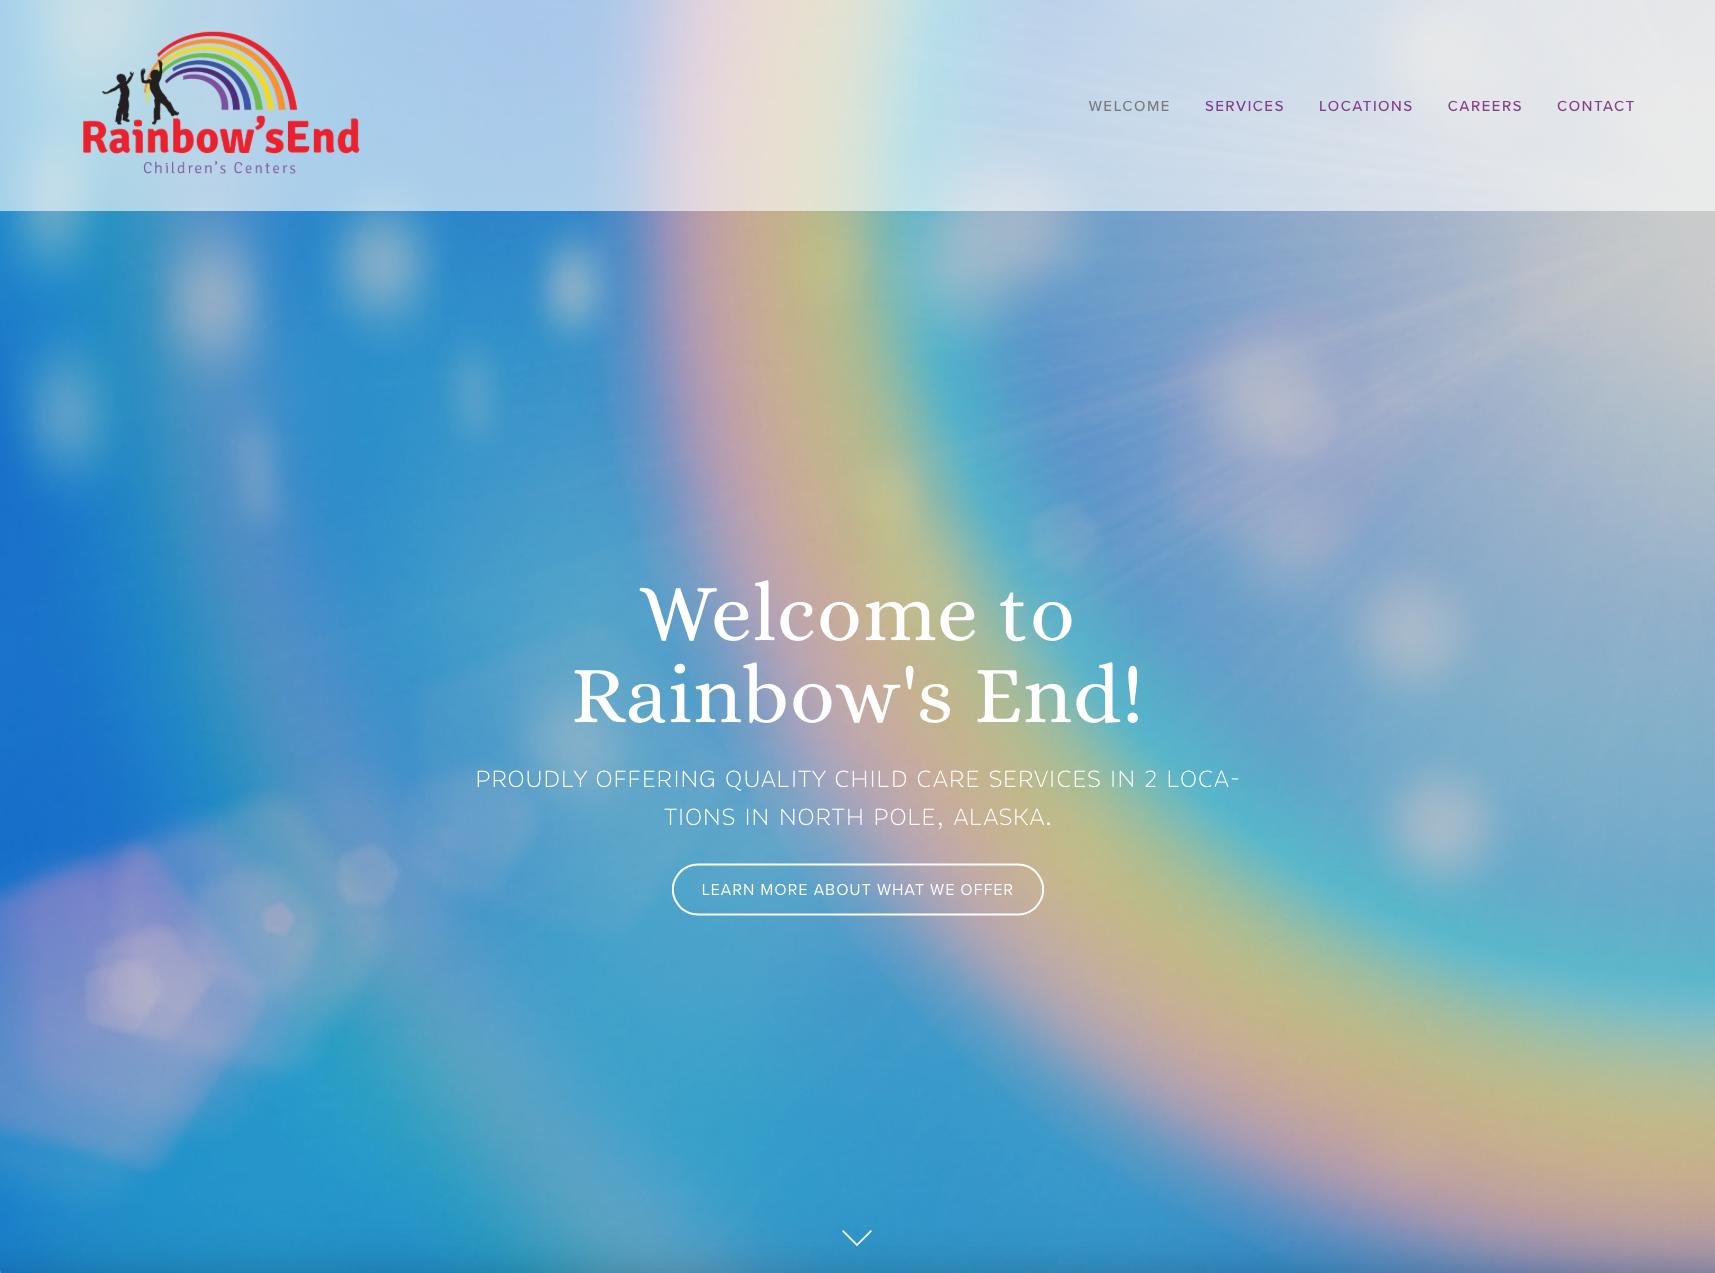 Rainbow's End Children's Centers